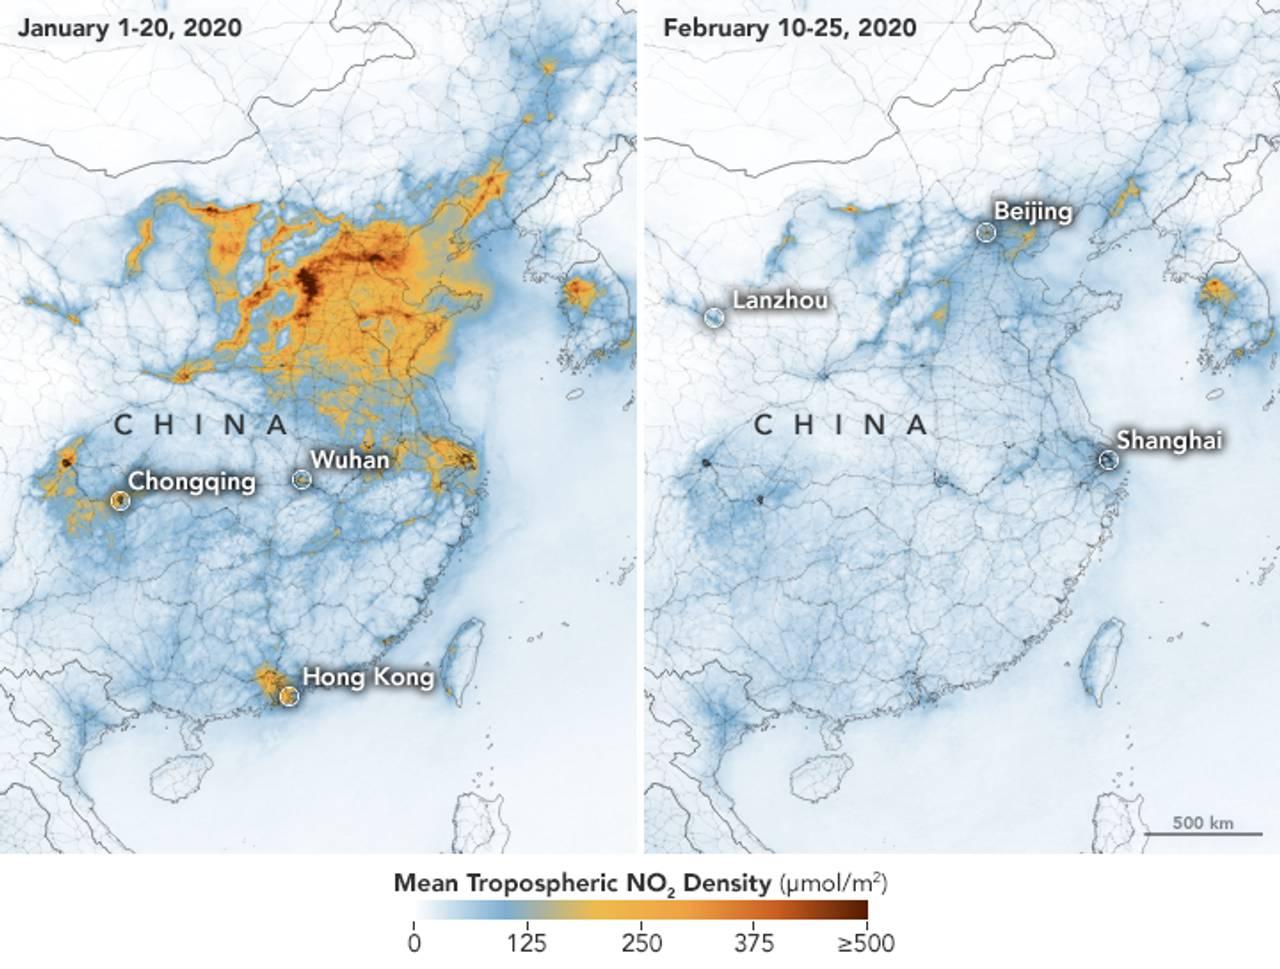 Luftkvaliteten over Kina